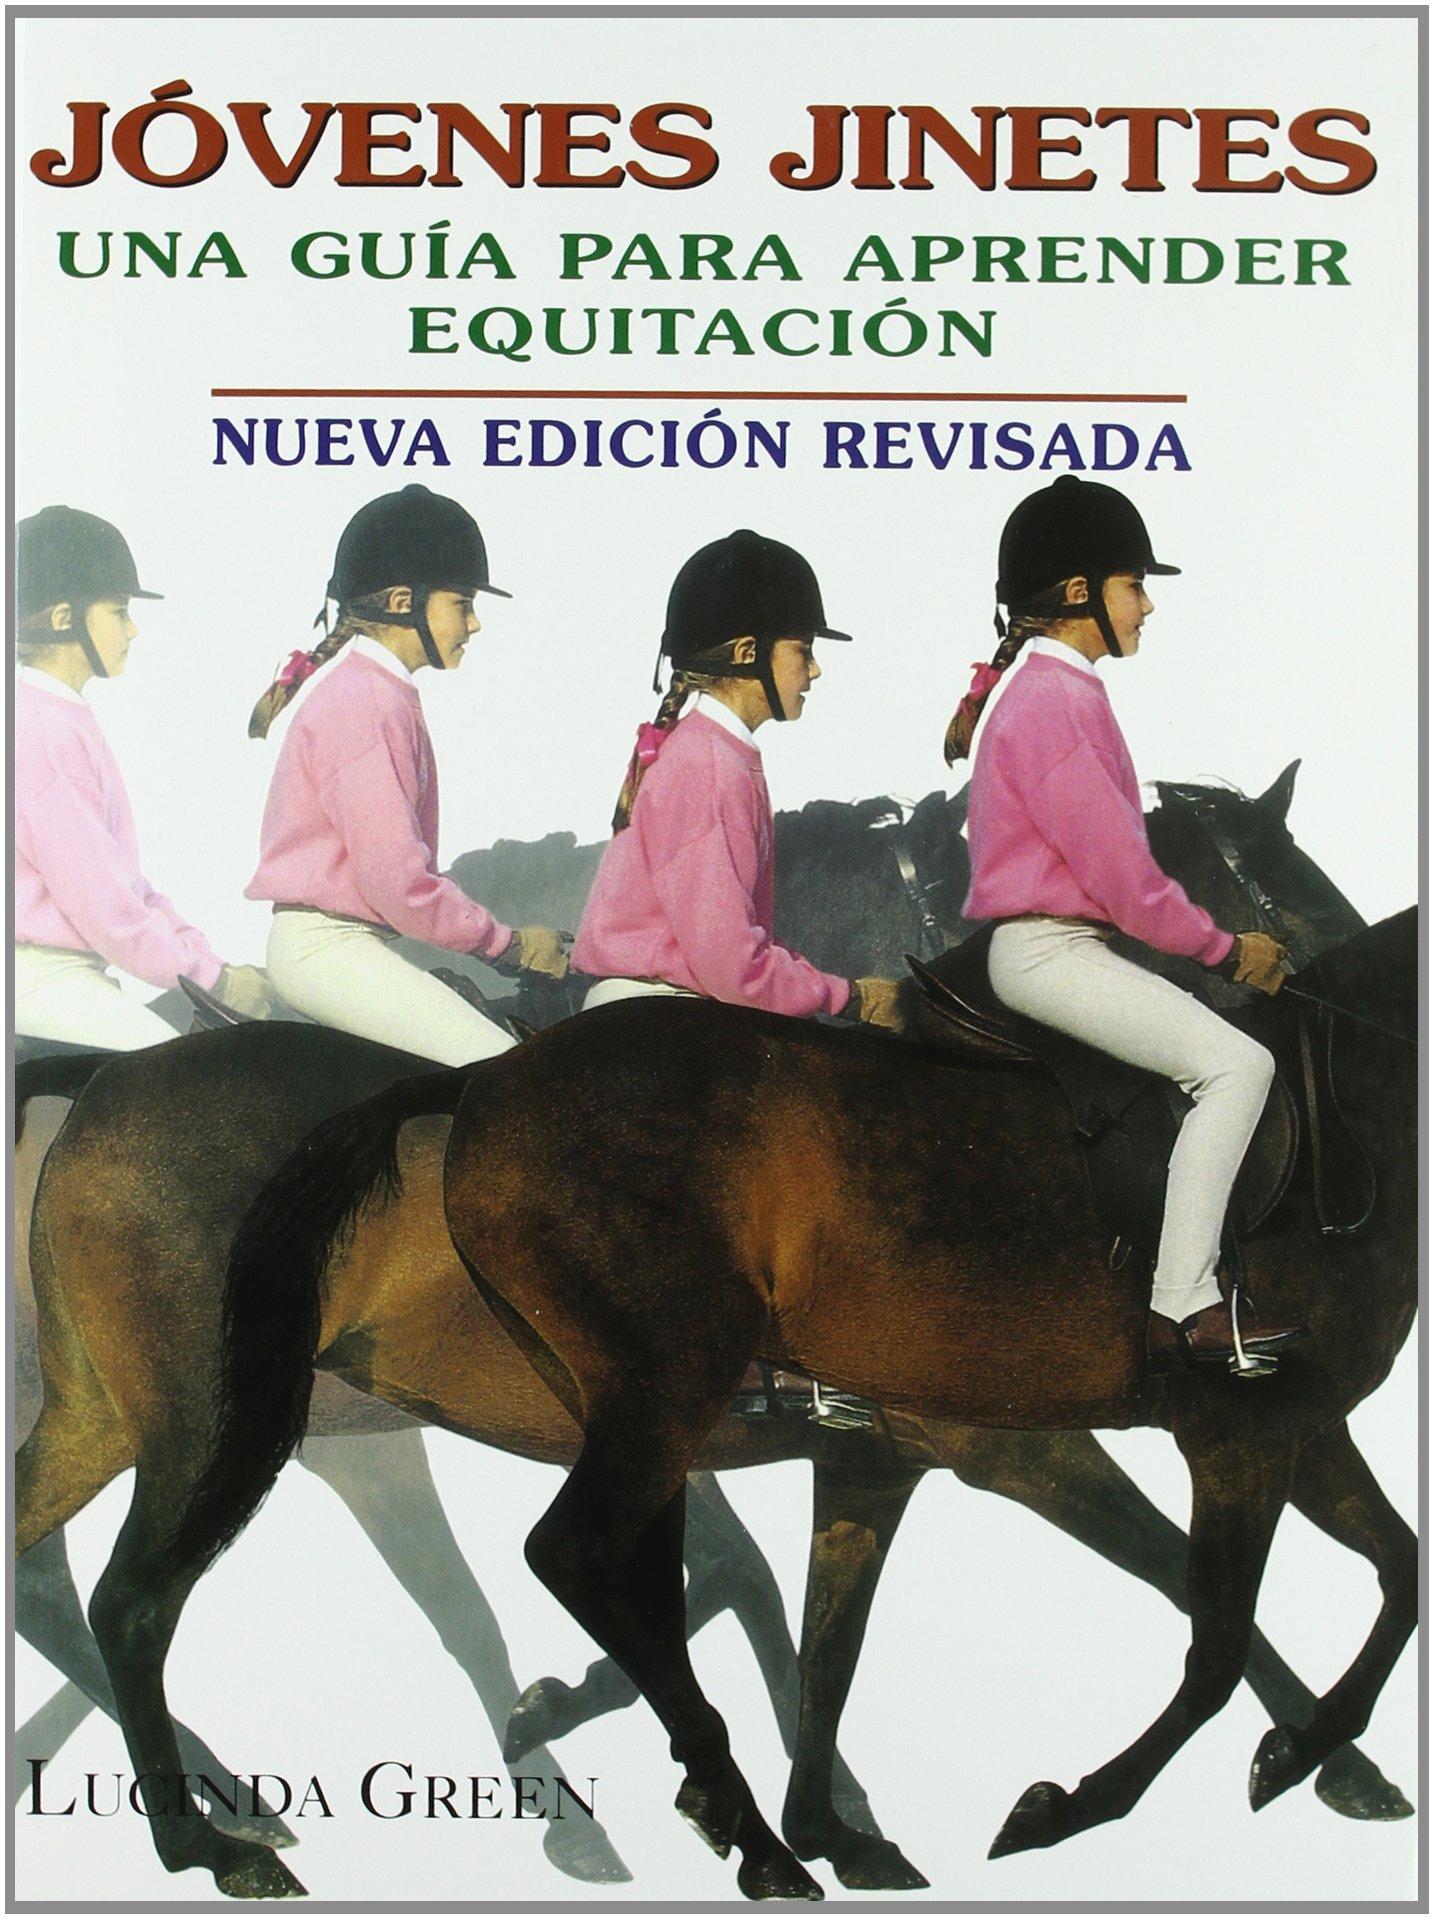 Jóvenes Jinetes (Hipica (tutor)) Tapa dura – 8 sep 2004 Lucinda Green 8479024623 GD-114-32-4594484 Horse Racing